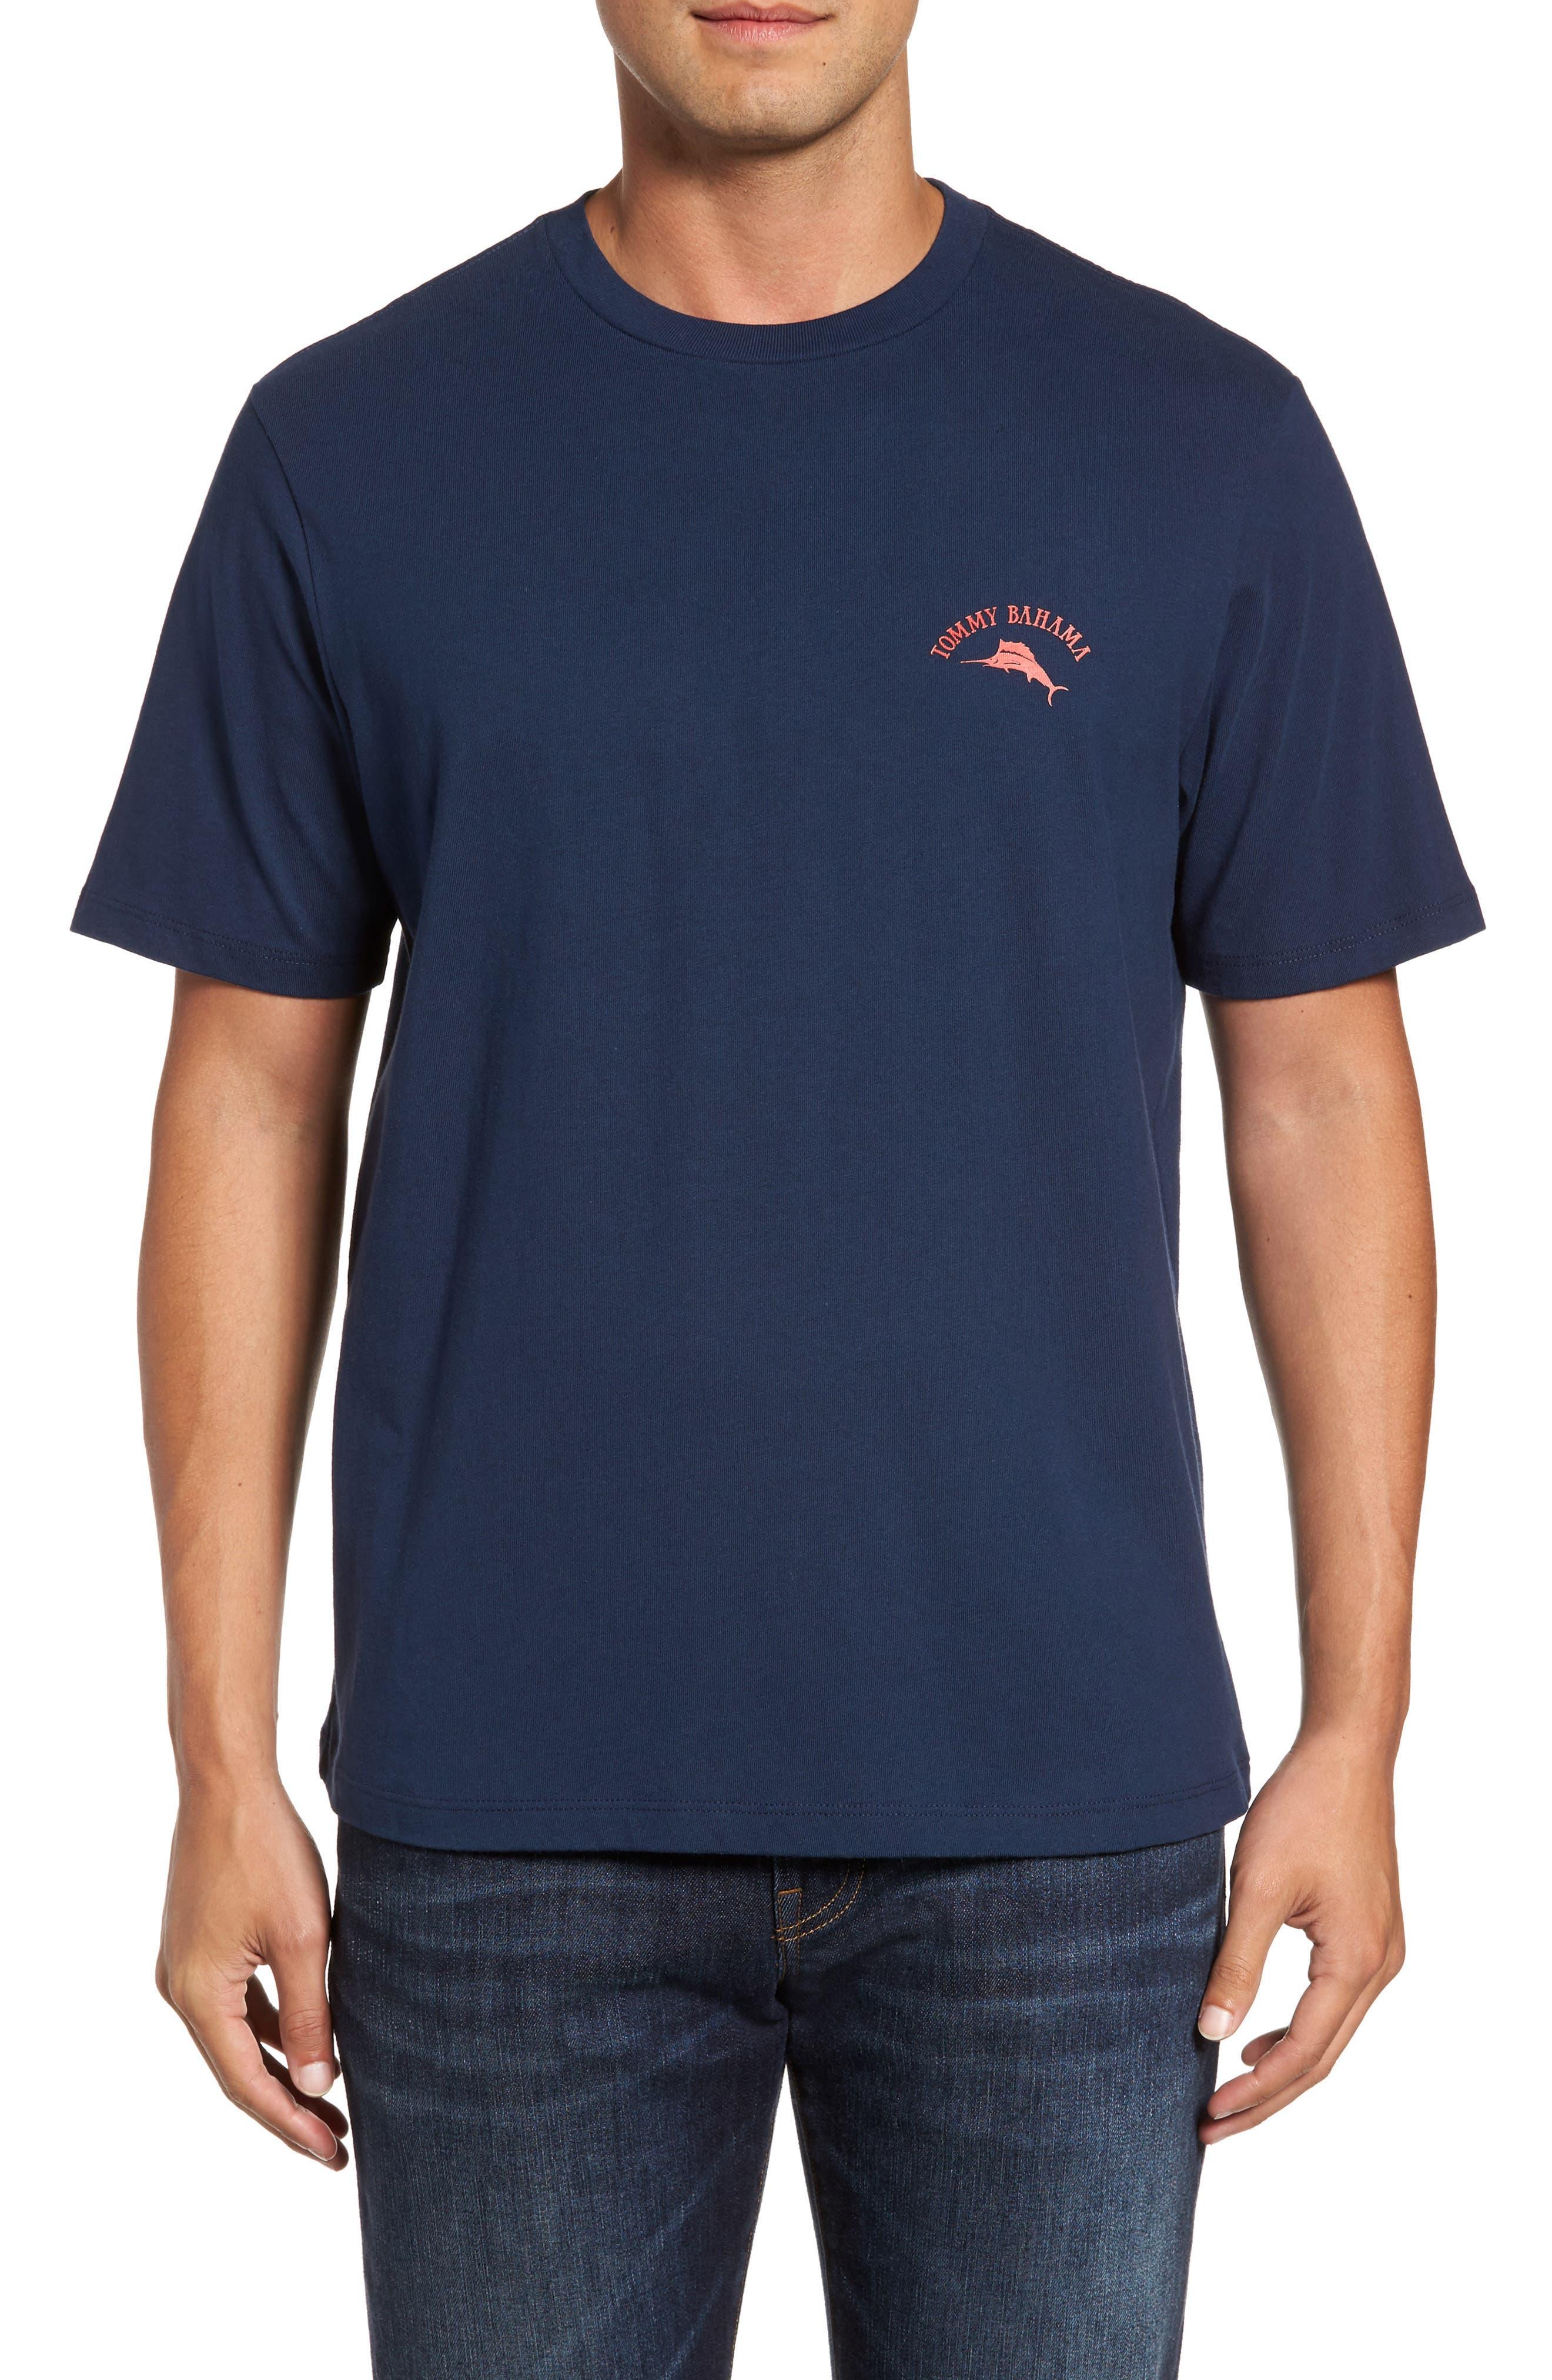 Alternate Image 2  - Tommy Bahama Big Boats Standard Fit T-Shirt